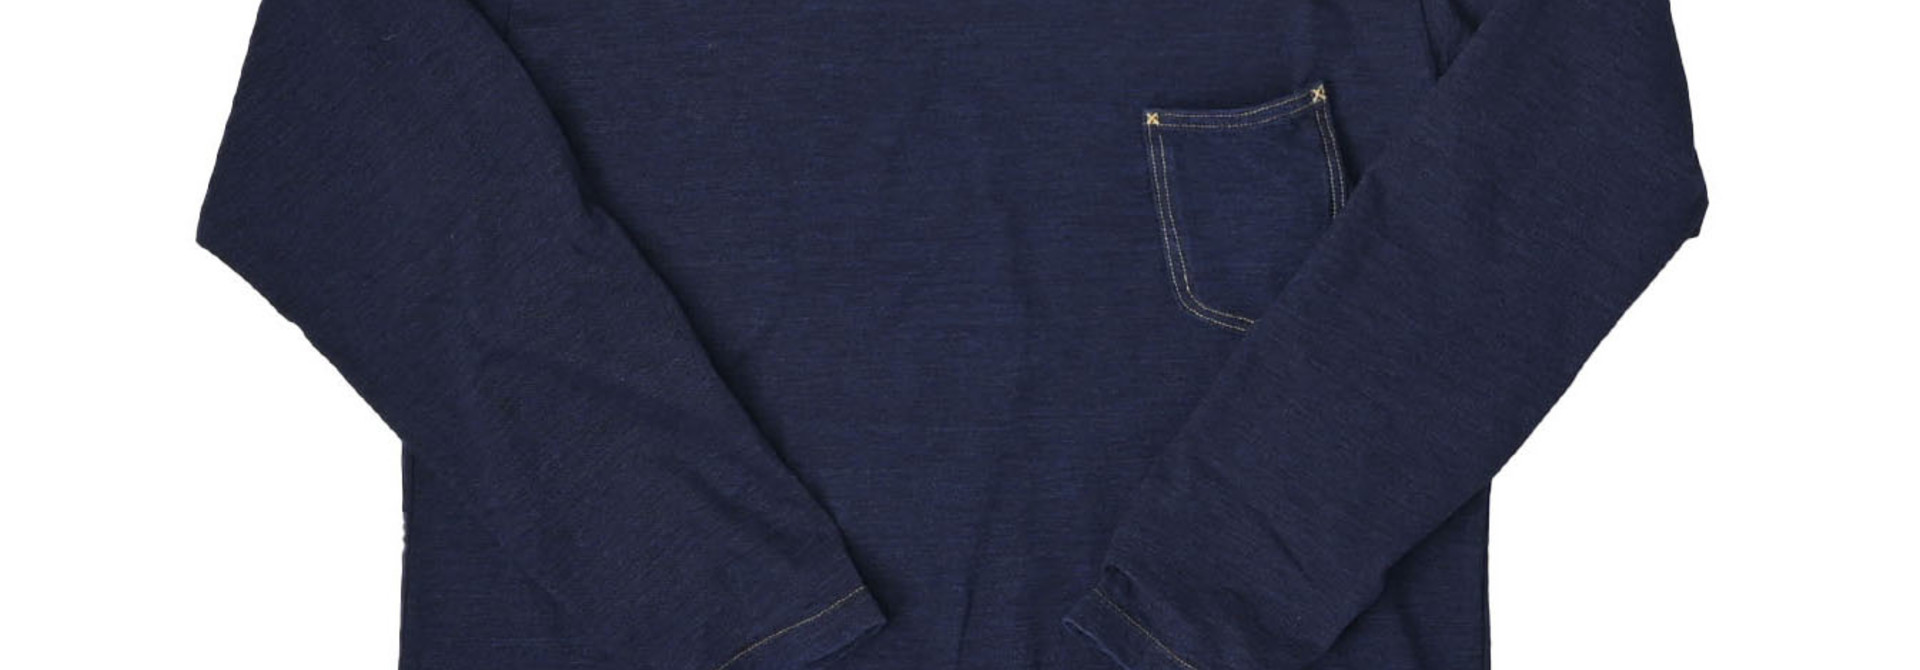 Indigo Zimbabwe 908 Ocean T-shirt